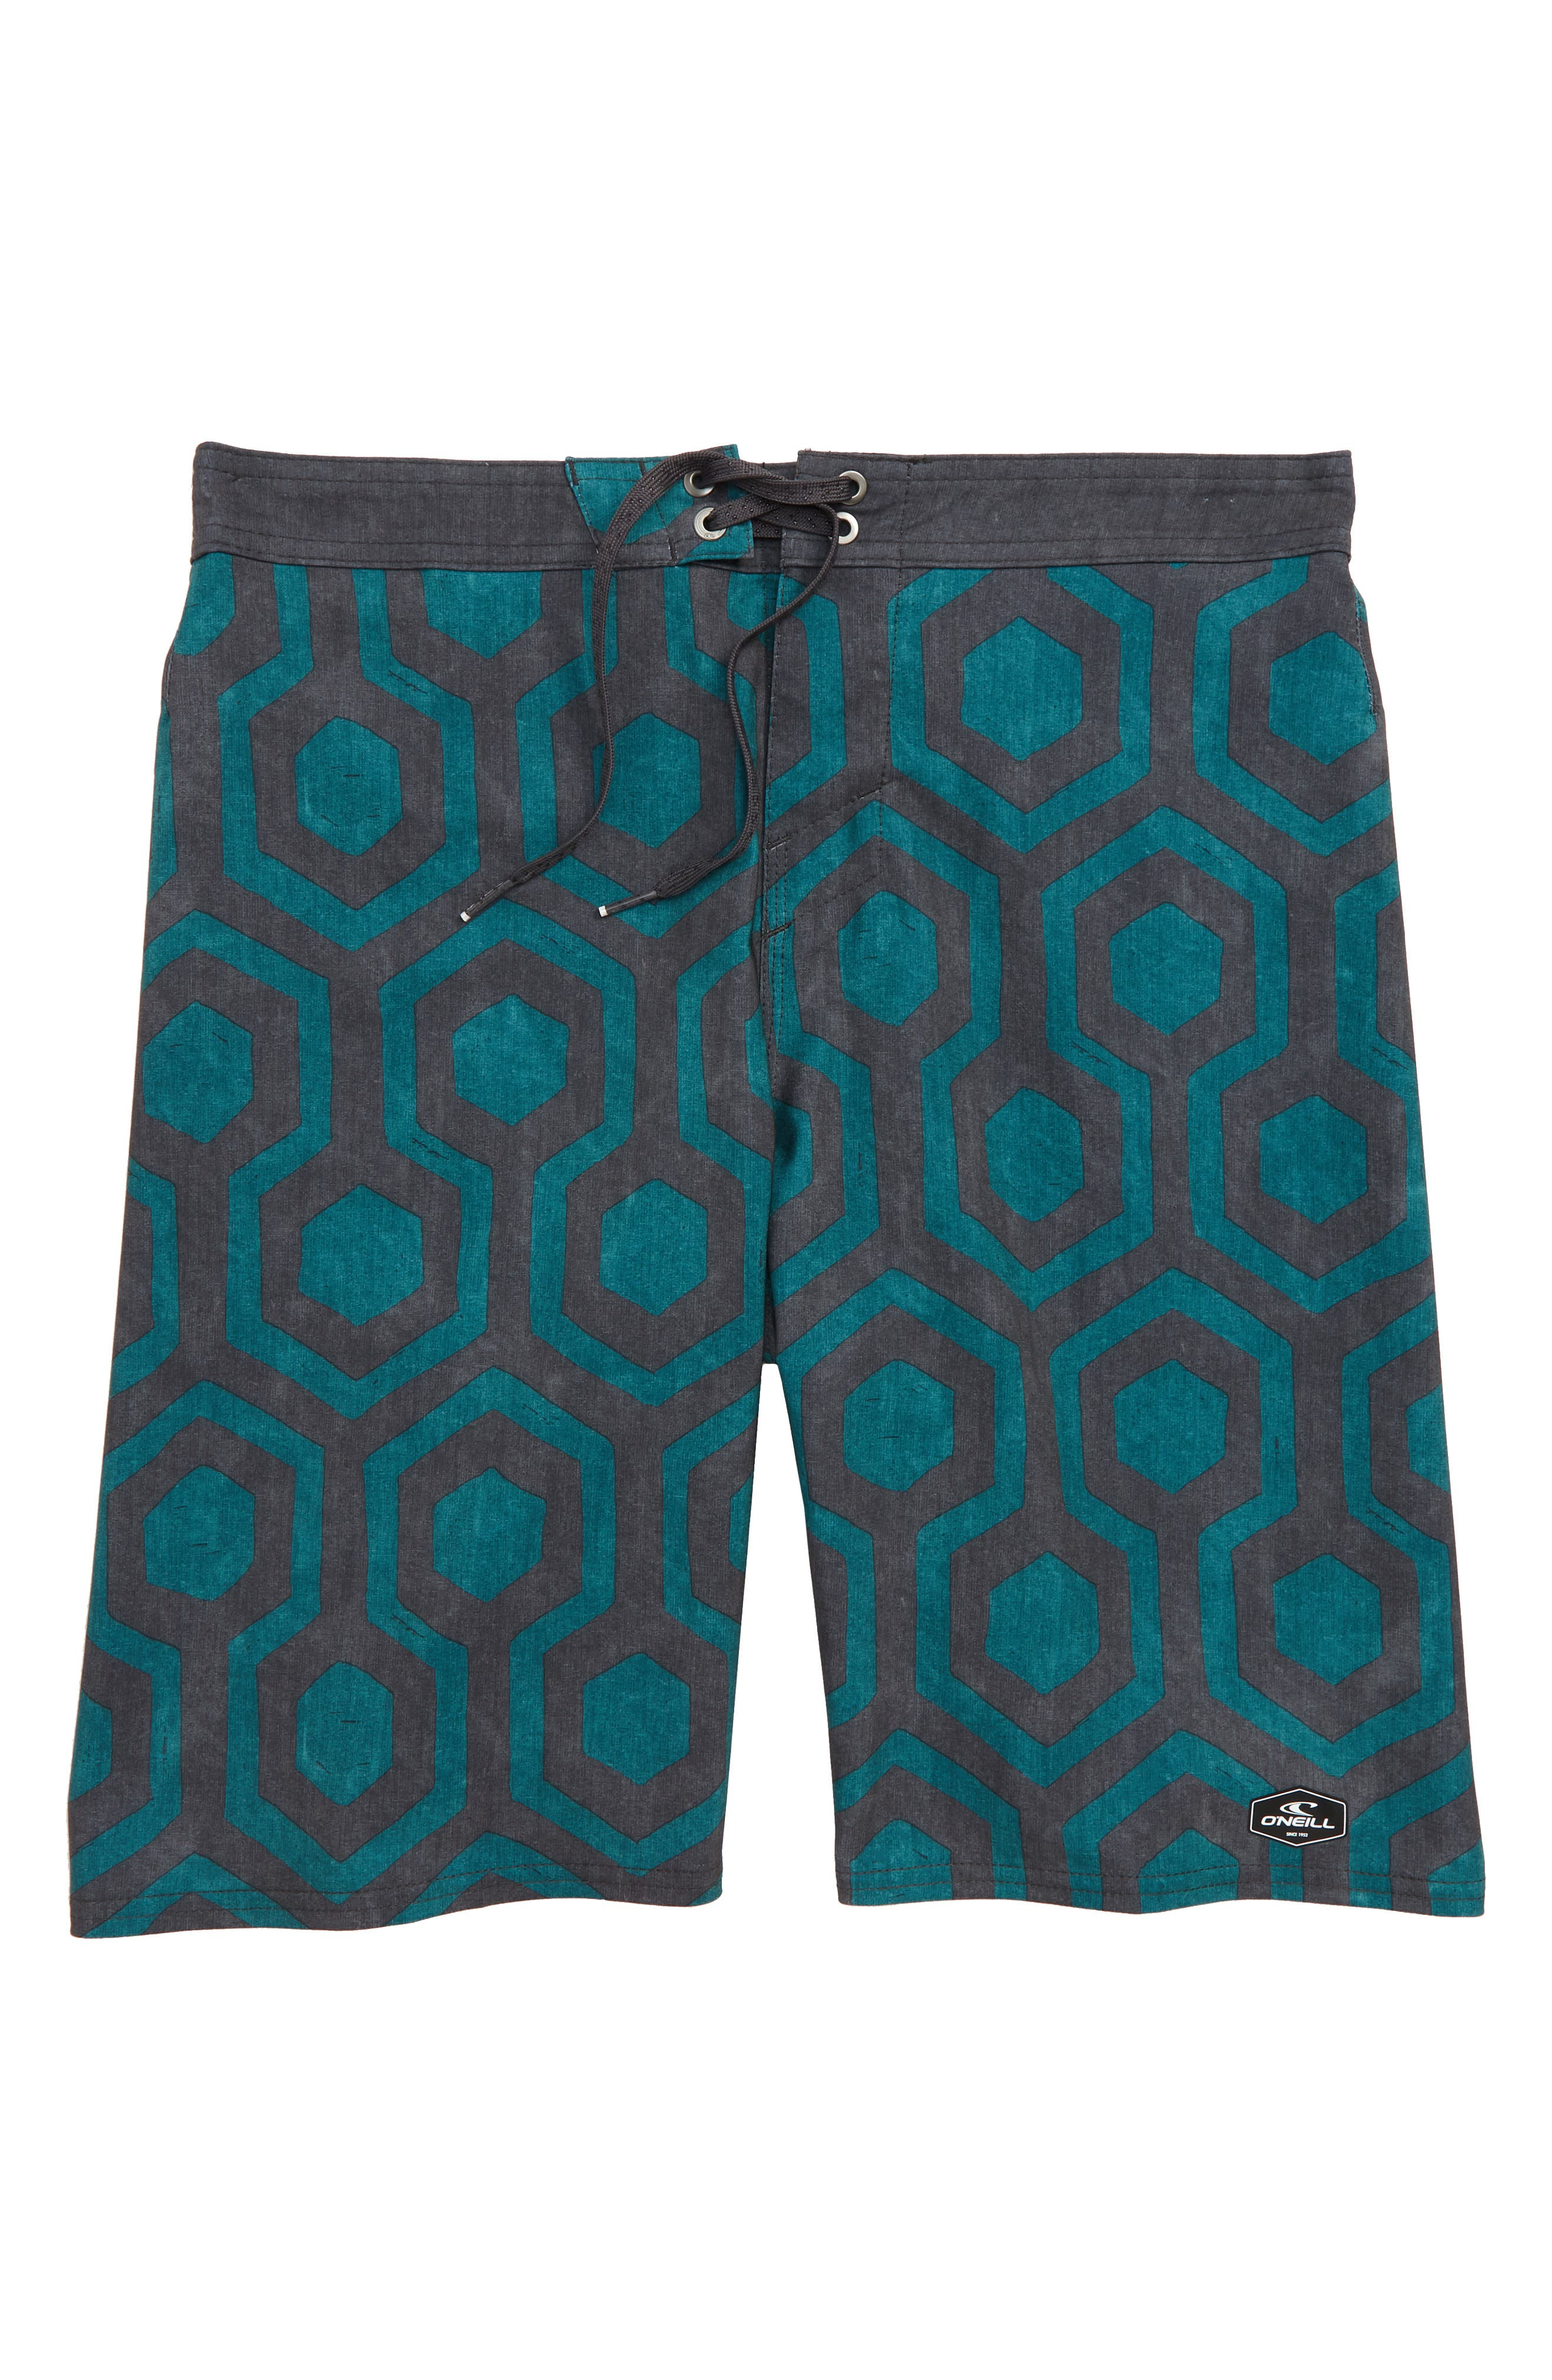 Hyperfreak Wrenched Board Shorts,                         Main,                         color, Asphalt